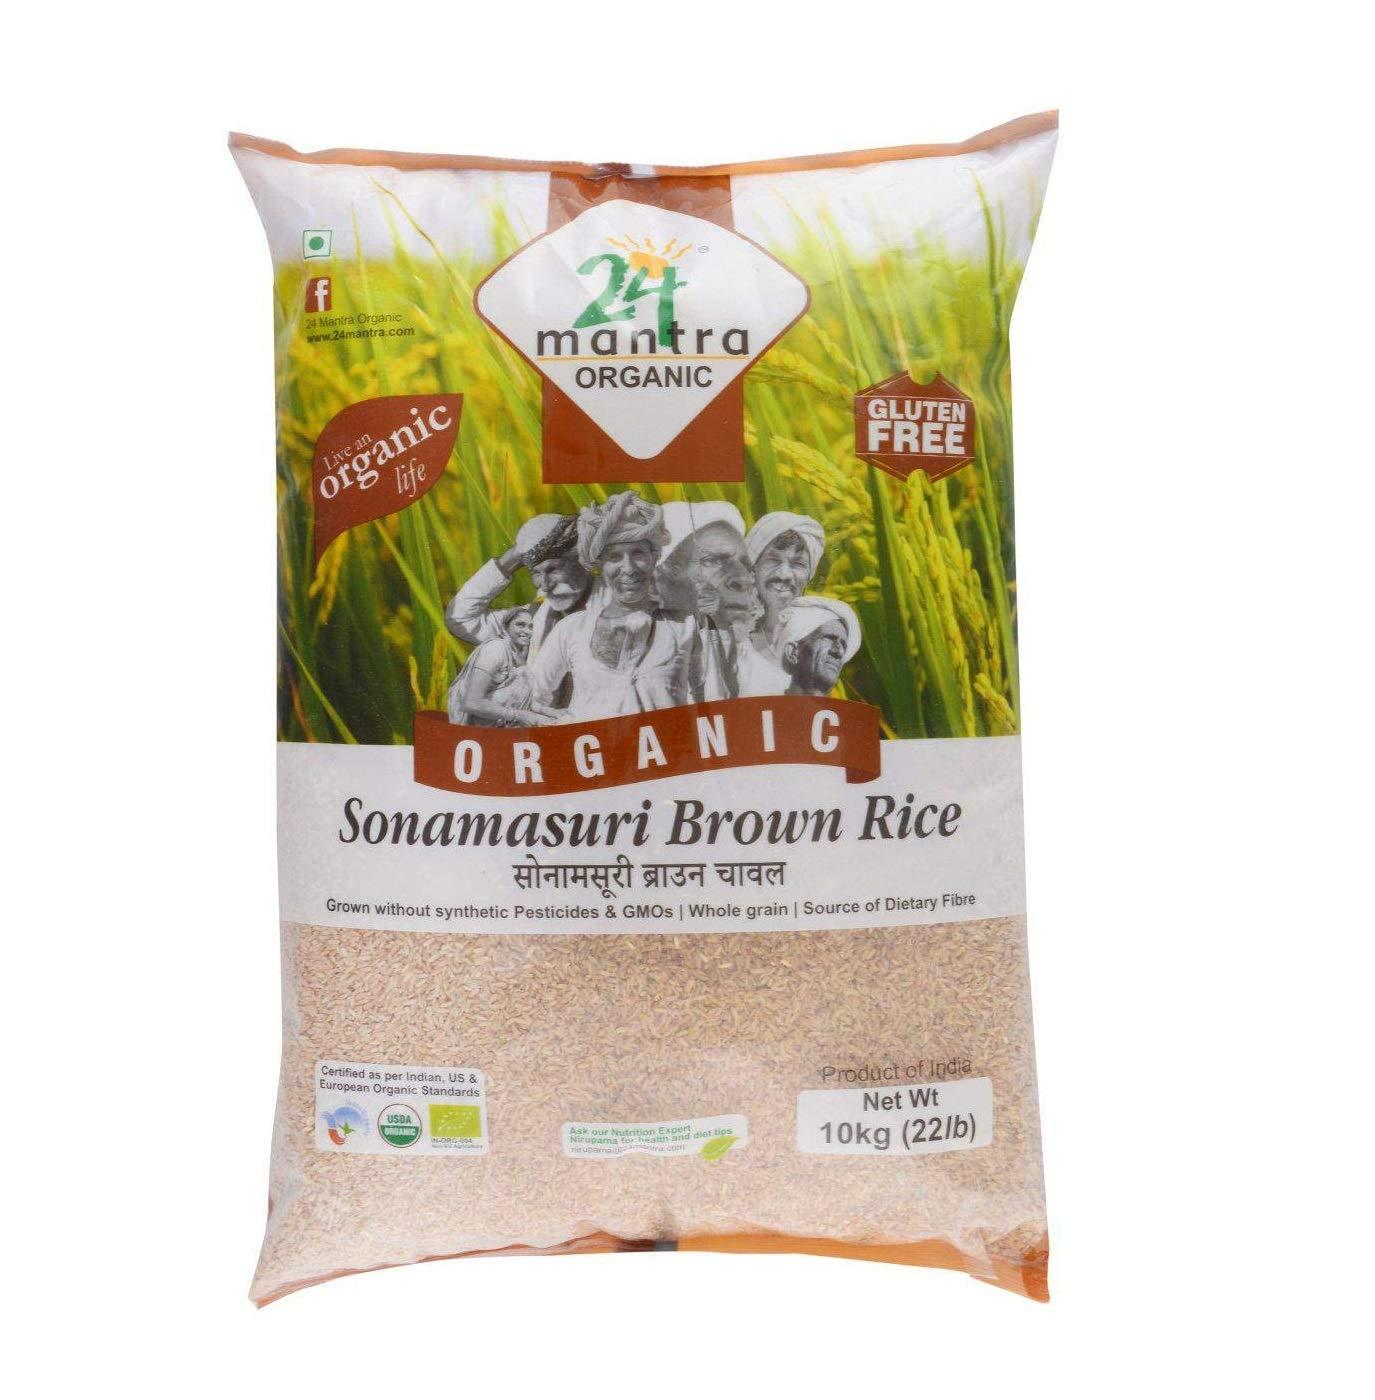 24 Mantra Organic Sonamasuri Brown Rice, 10kg (B01LL3XQ7I) Amazon Price History, Amazon Price Tracker